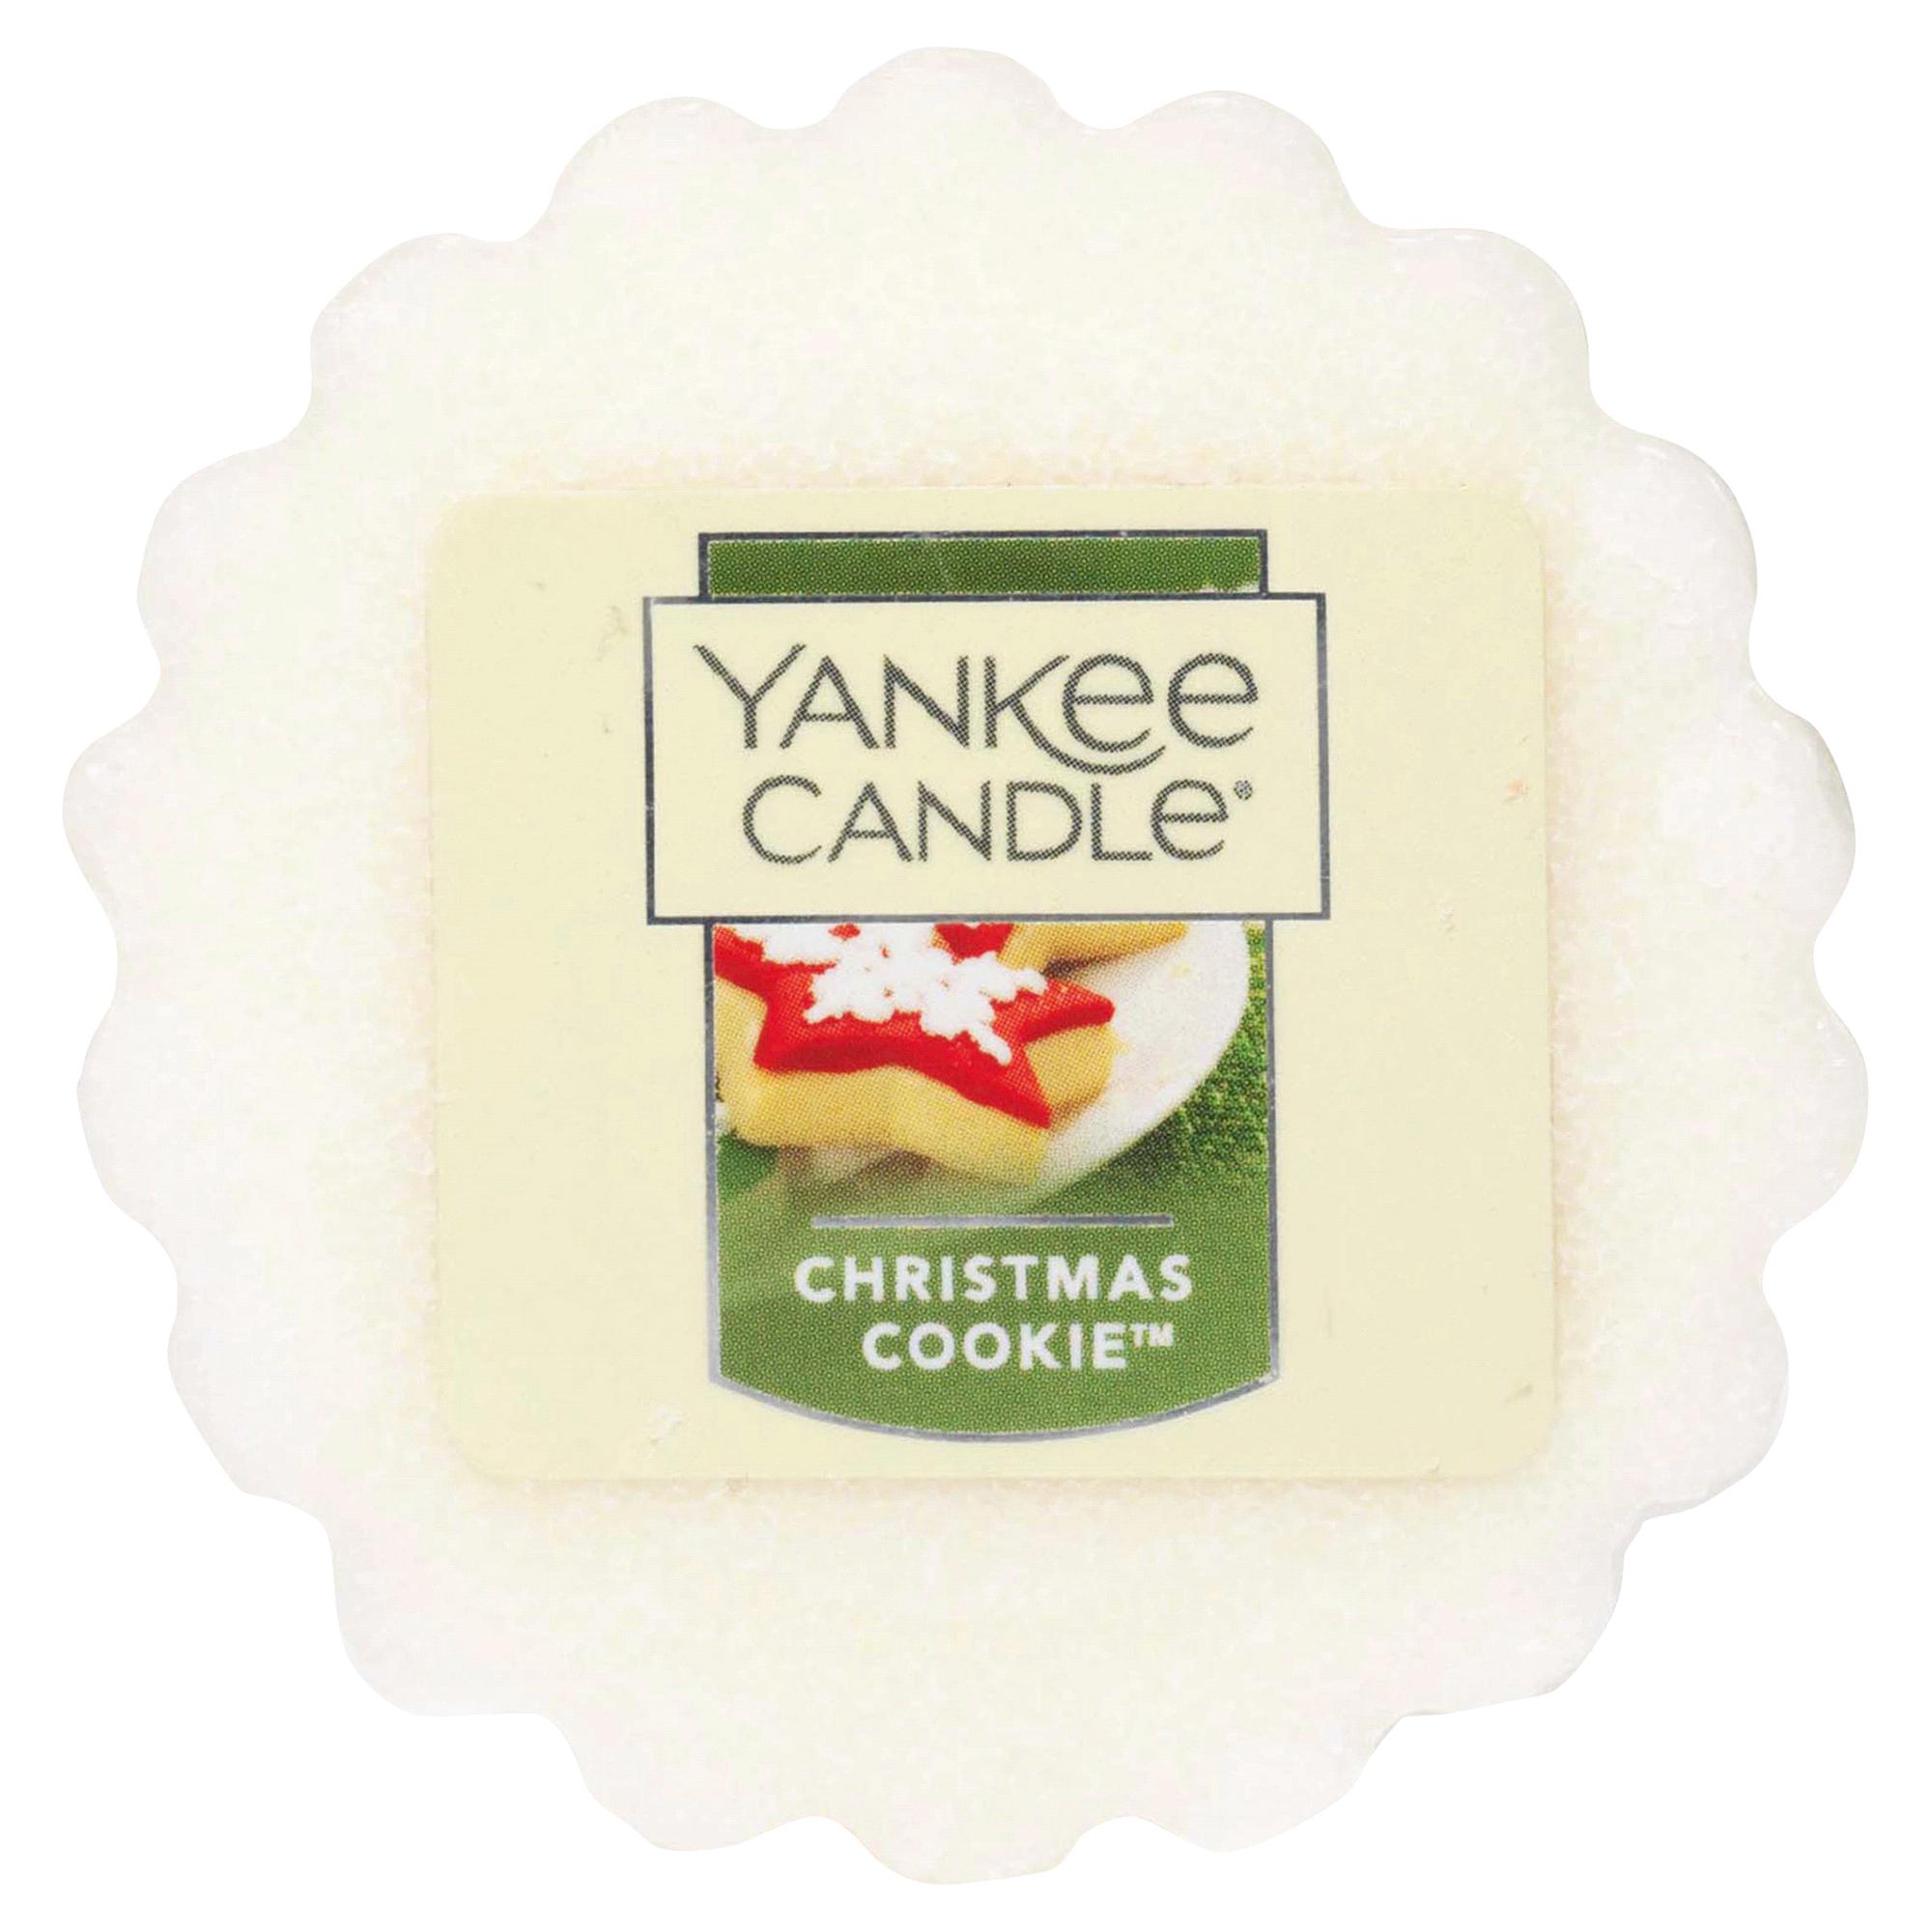 Yankee Candle Tart Christmas Cookies 0.8 Oz. | Meijer.com